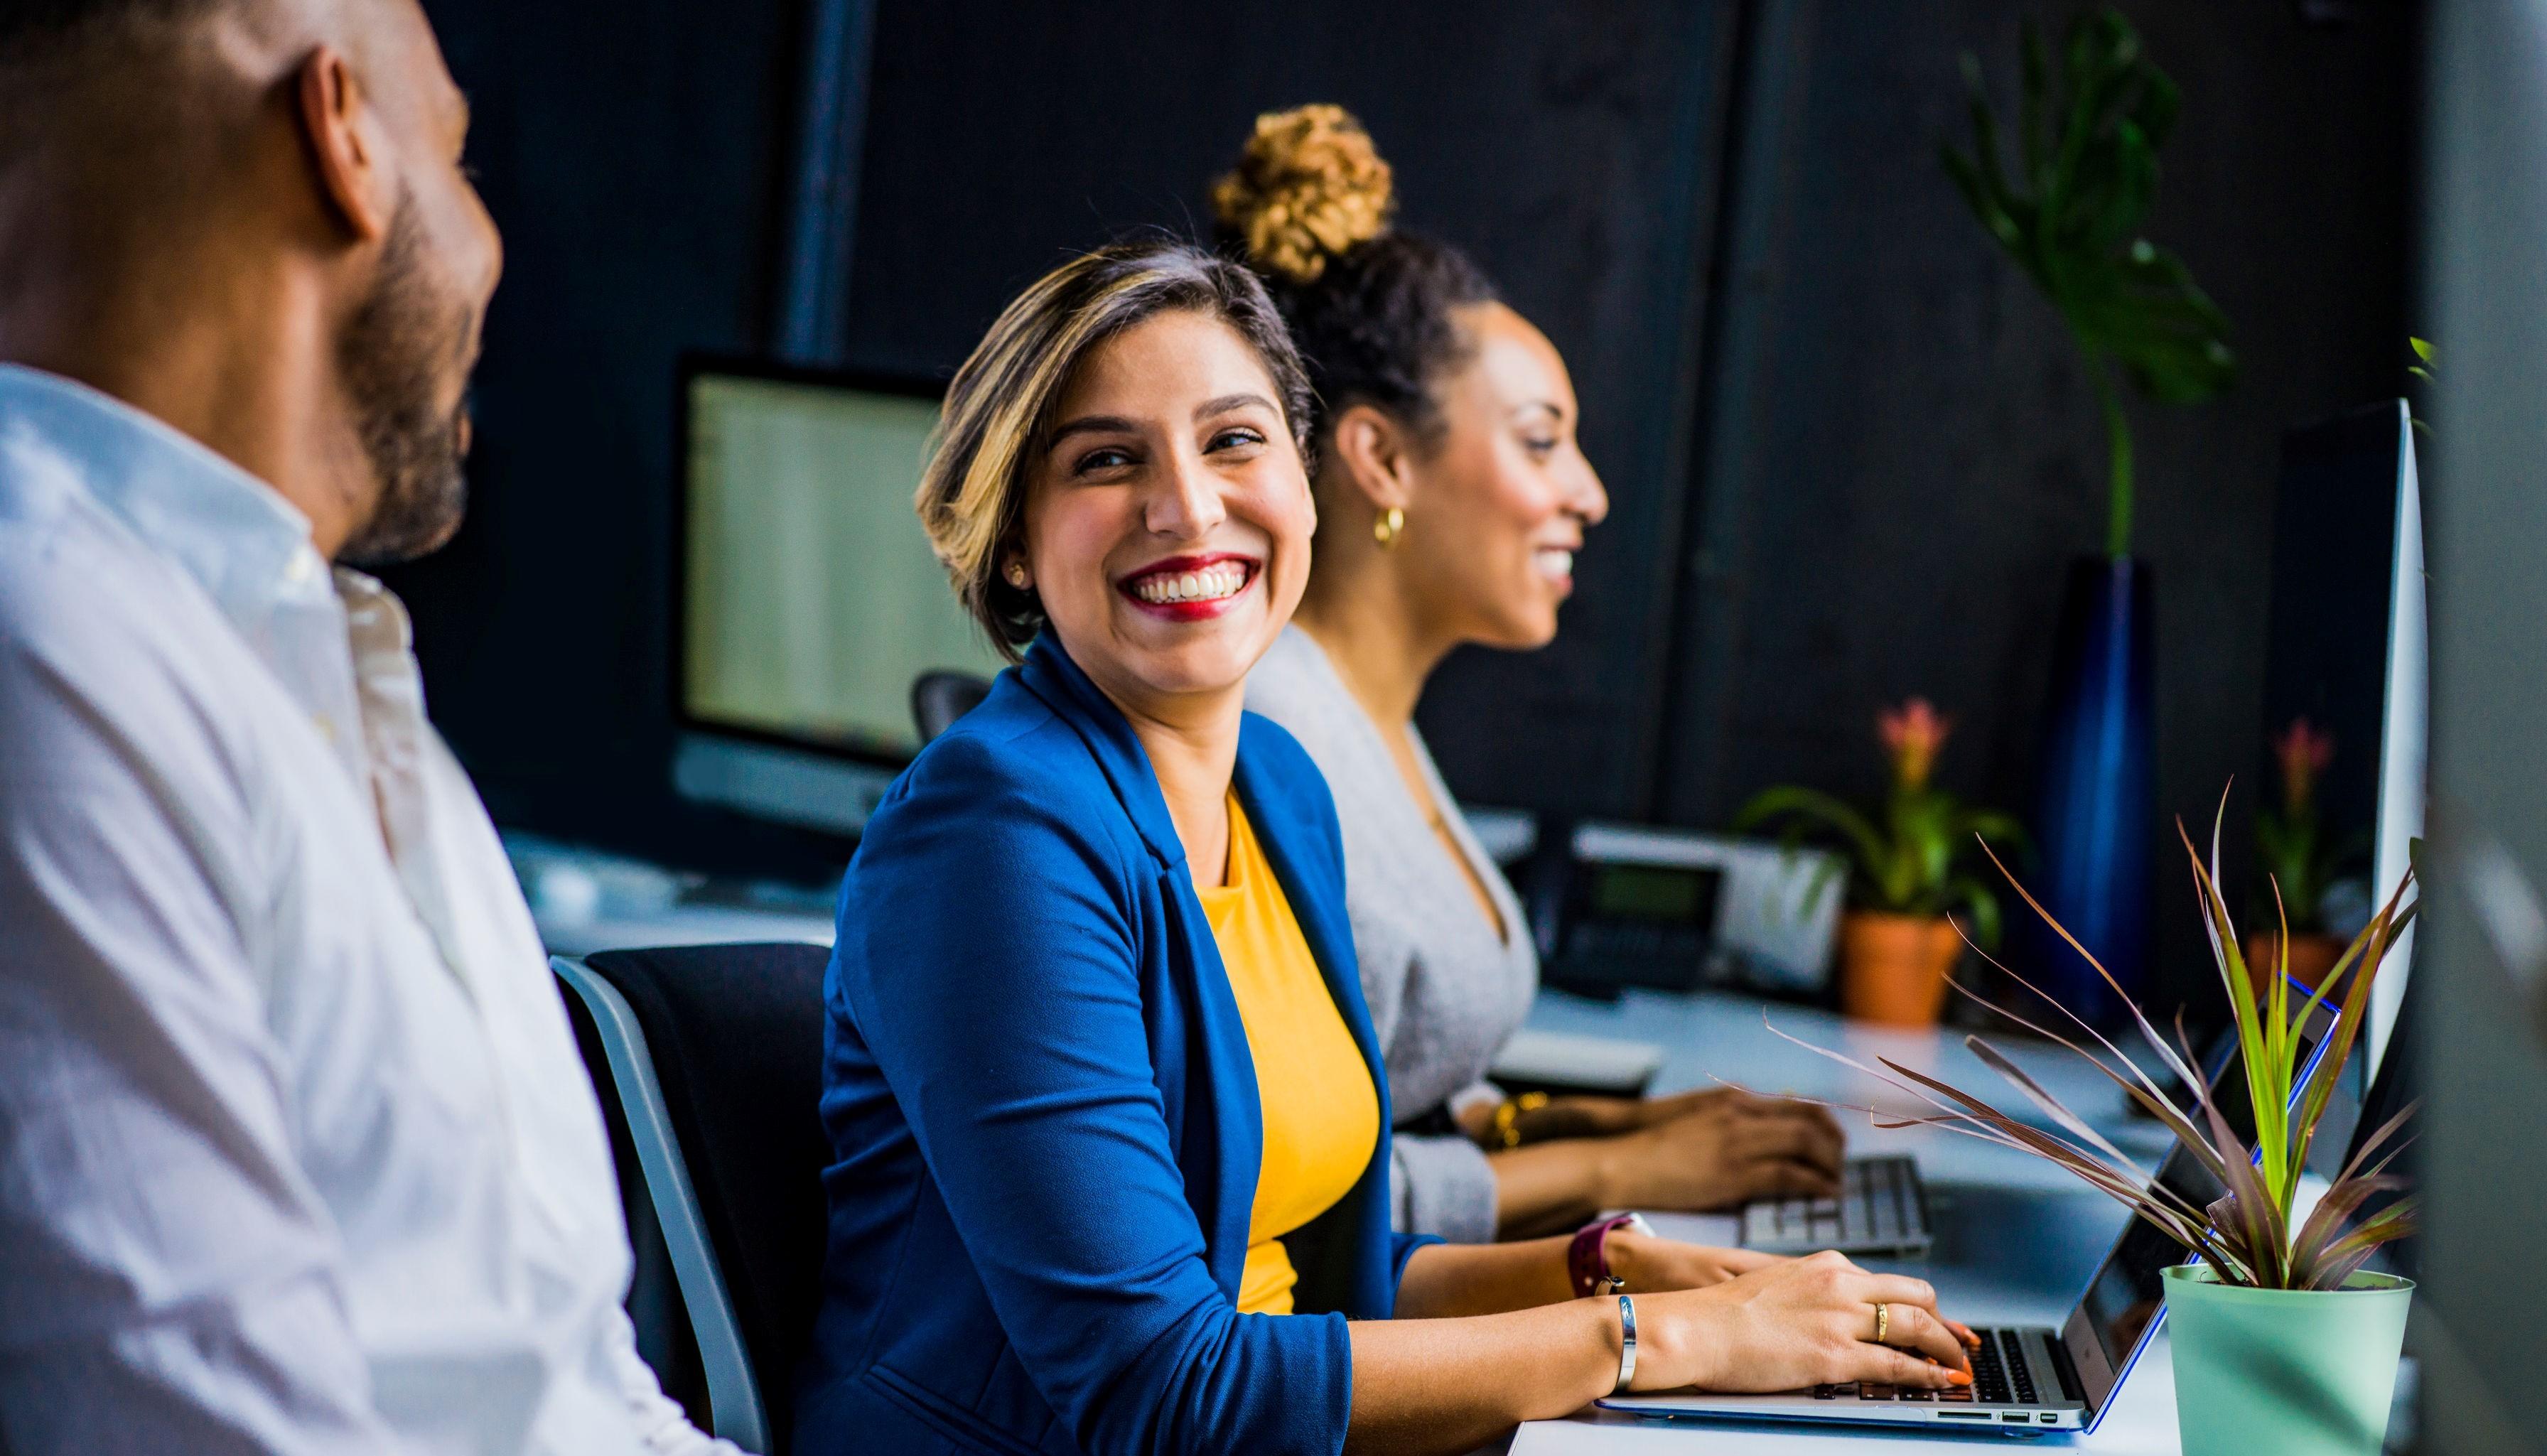 Digital Workplace ¿por dónde empezamos?